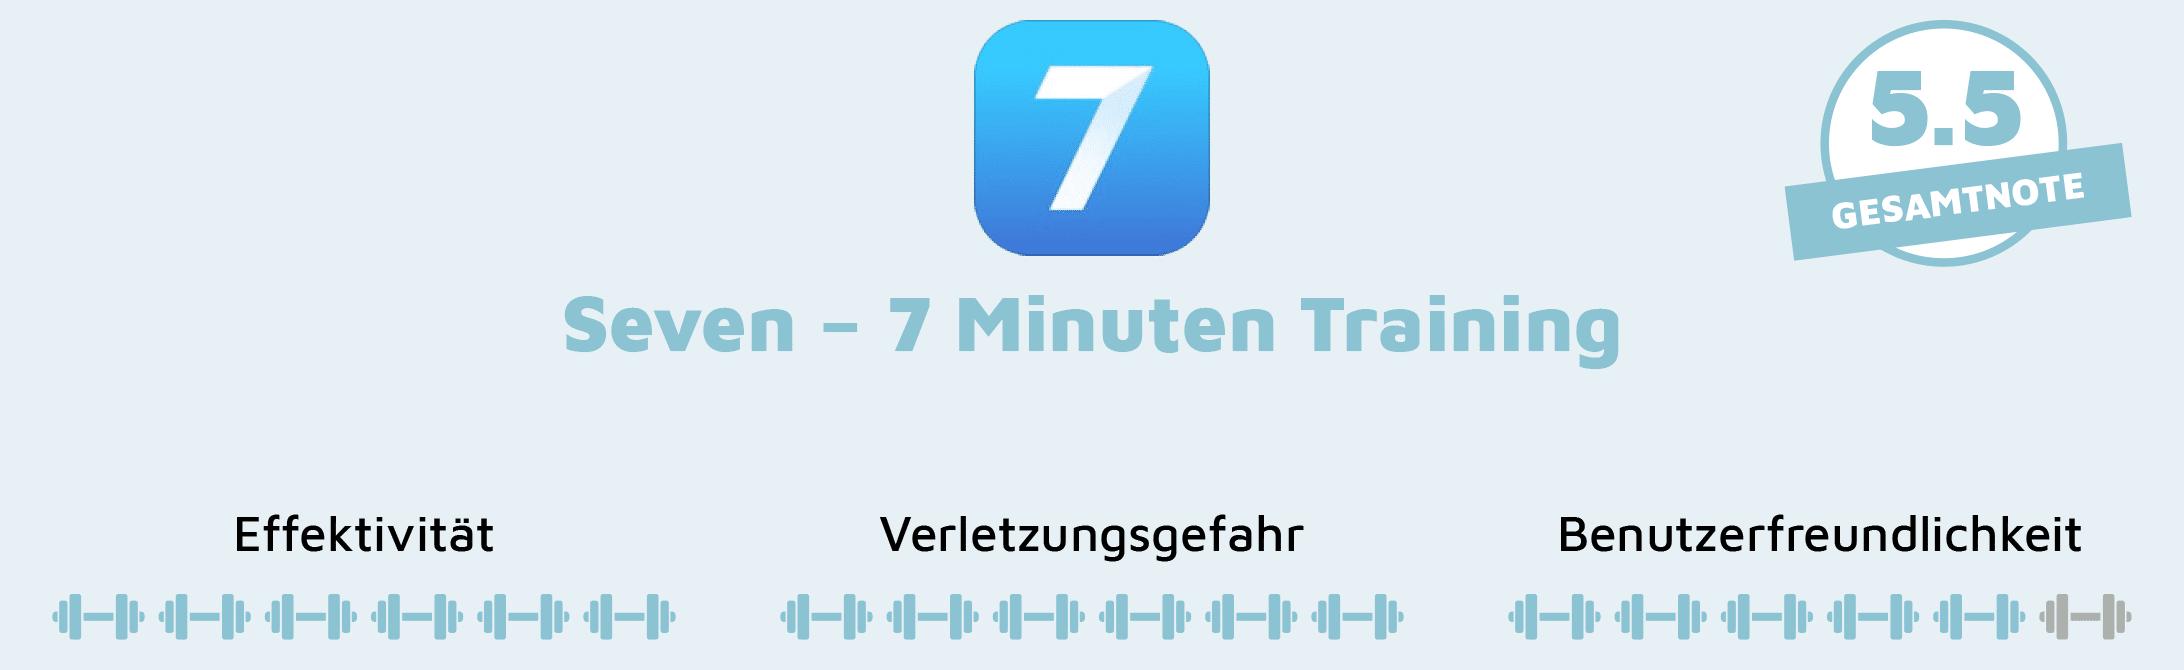 Fazit der App Seven